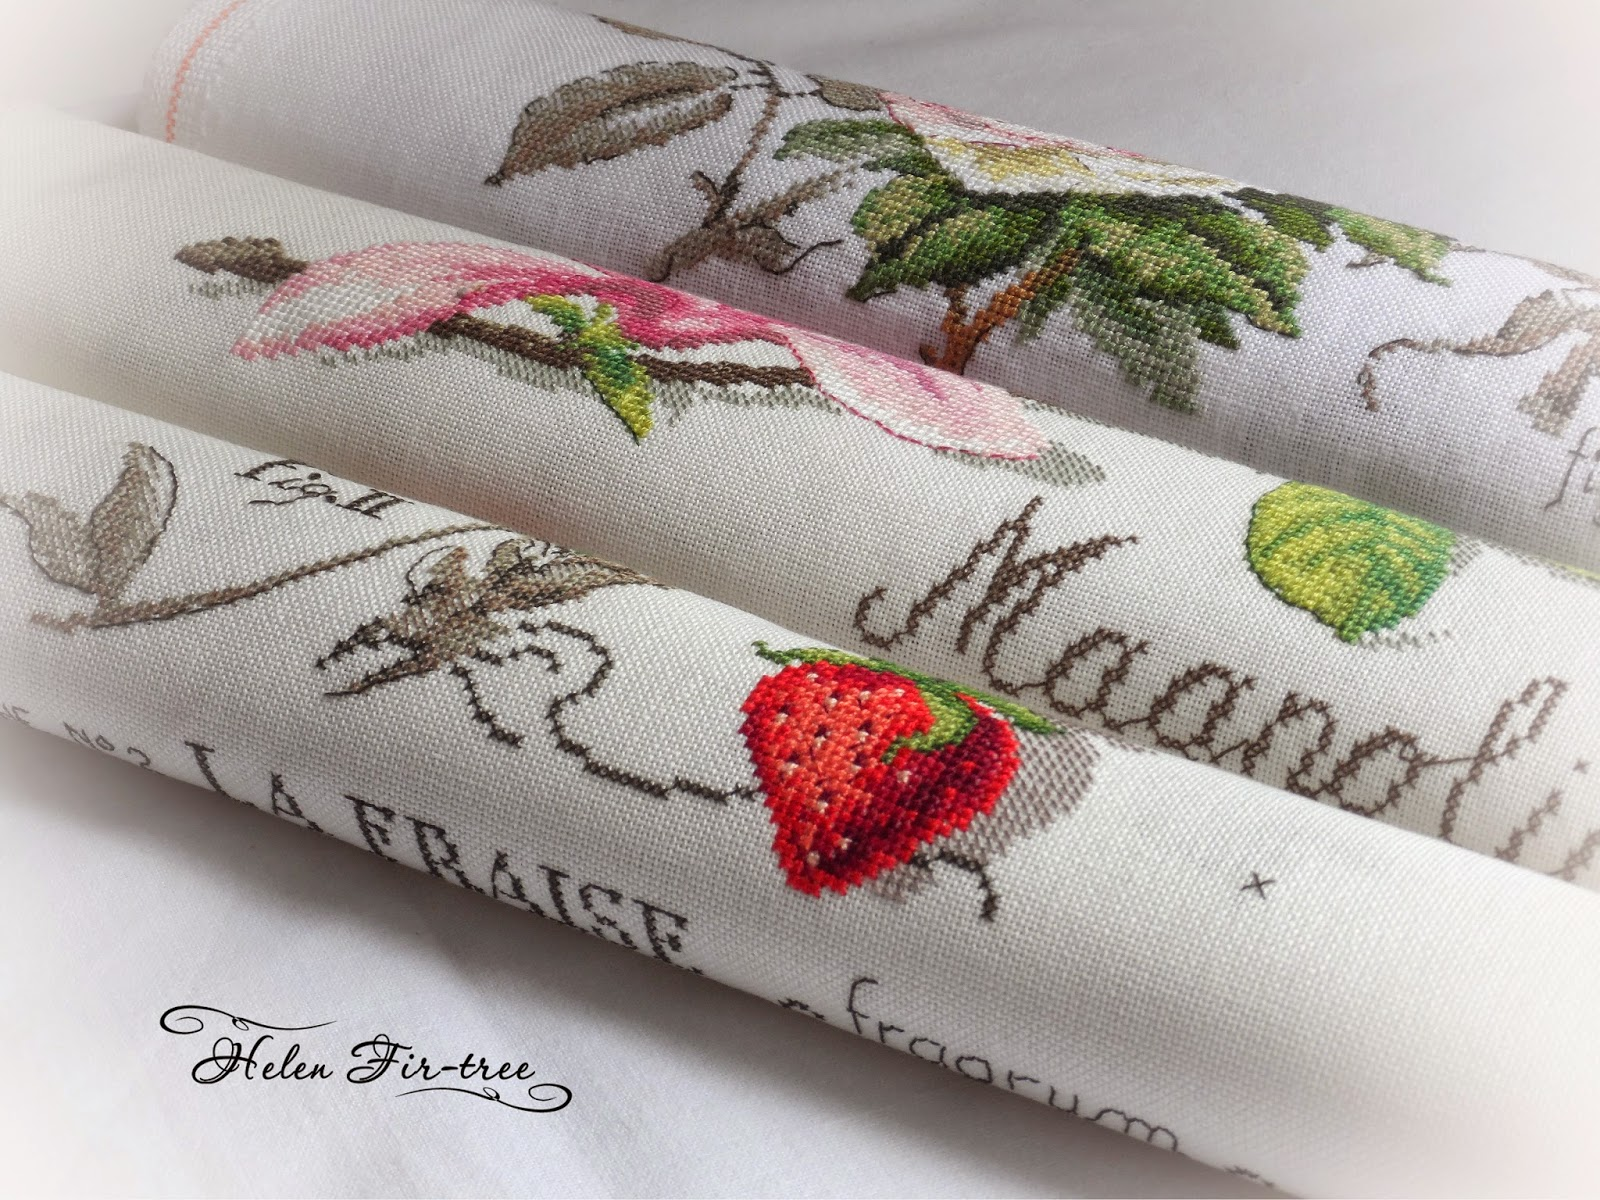 Helen Fir-tree вышивка крестом розы V. Enginger stitch roses  V. Enginger